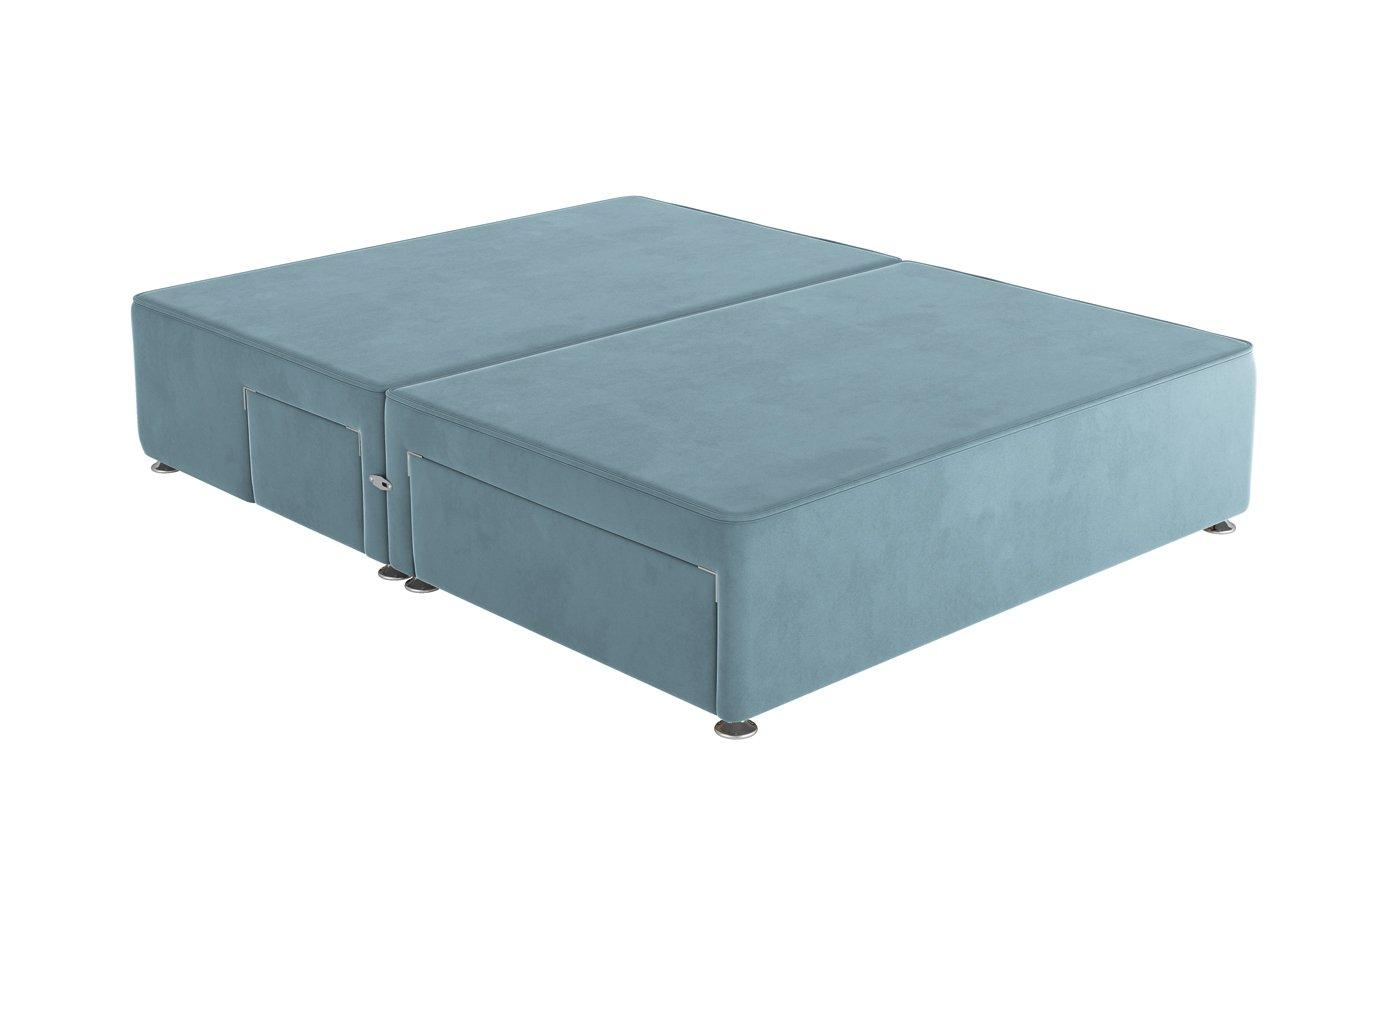 Sleepeezee K P/T 2+2 Drw Base Plush Sky 5'0 King BLUE